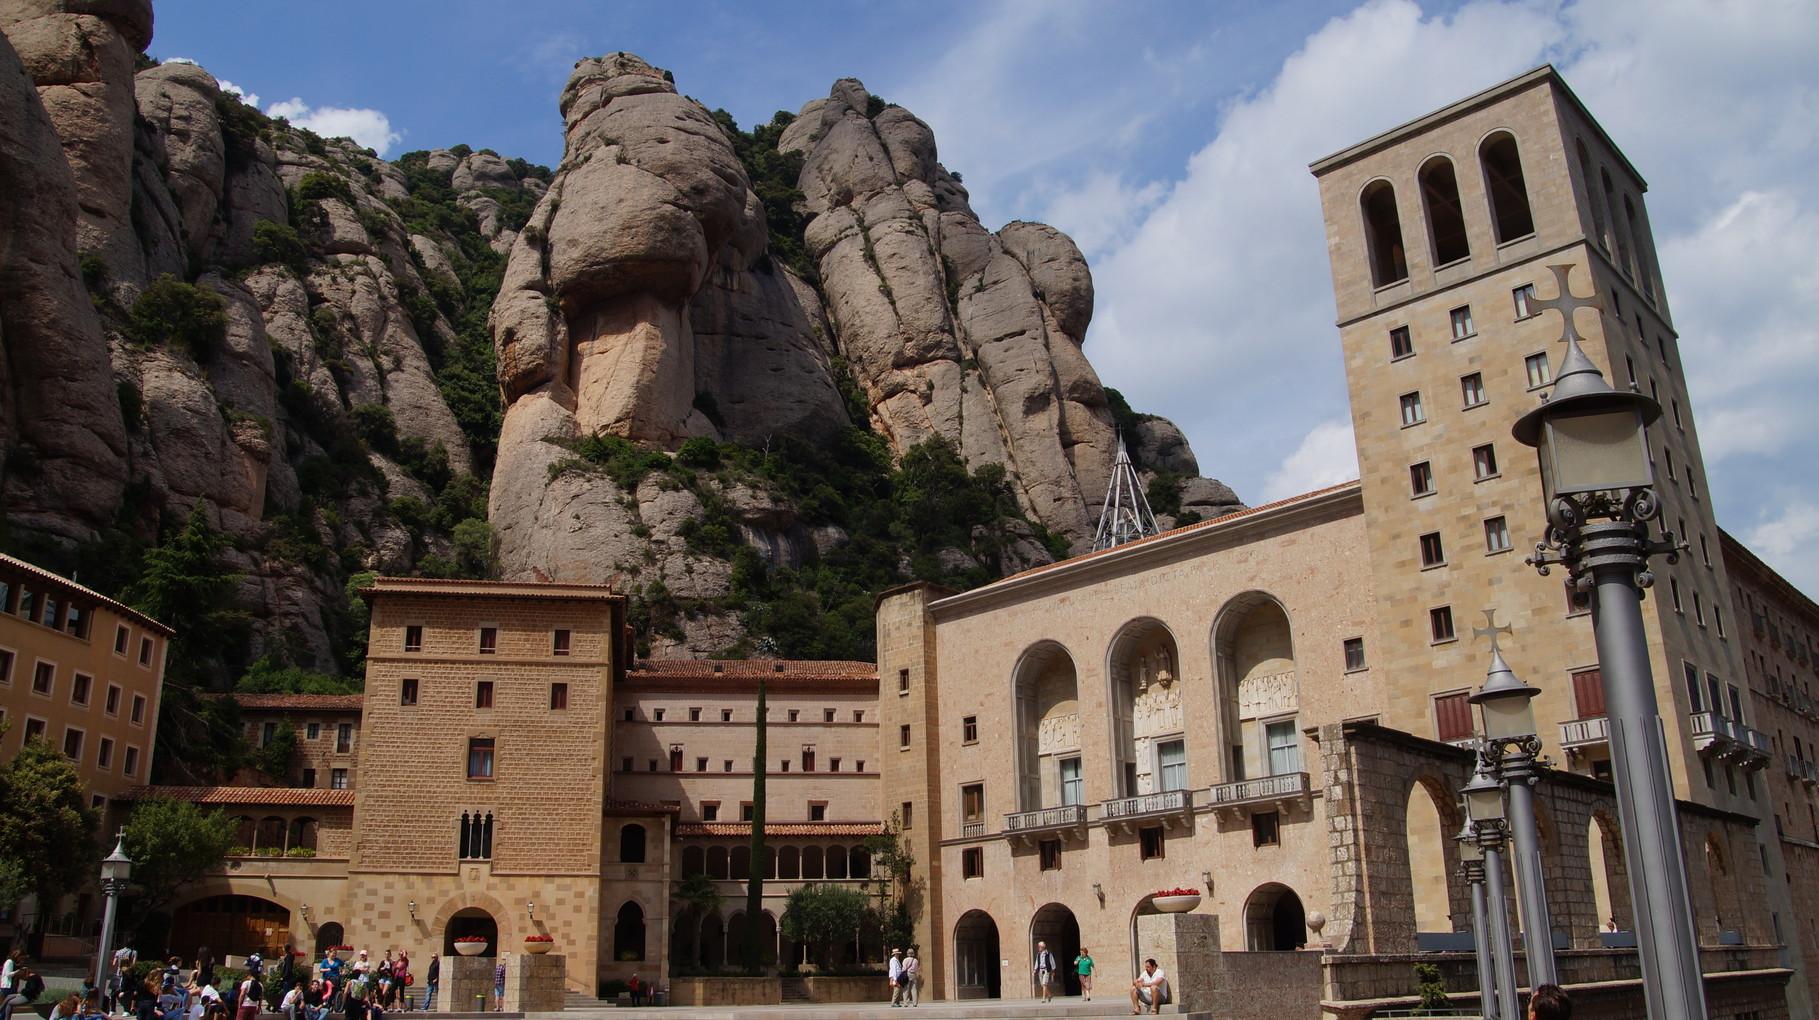 <B>Heute leben dort etwa 80 Mönche.</B>